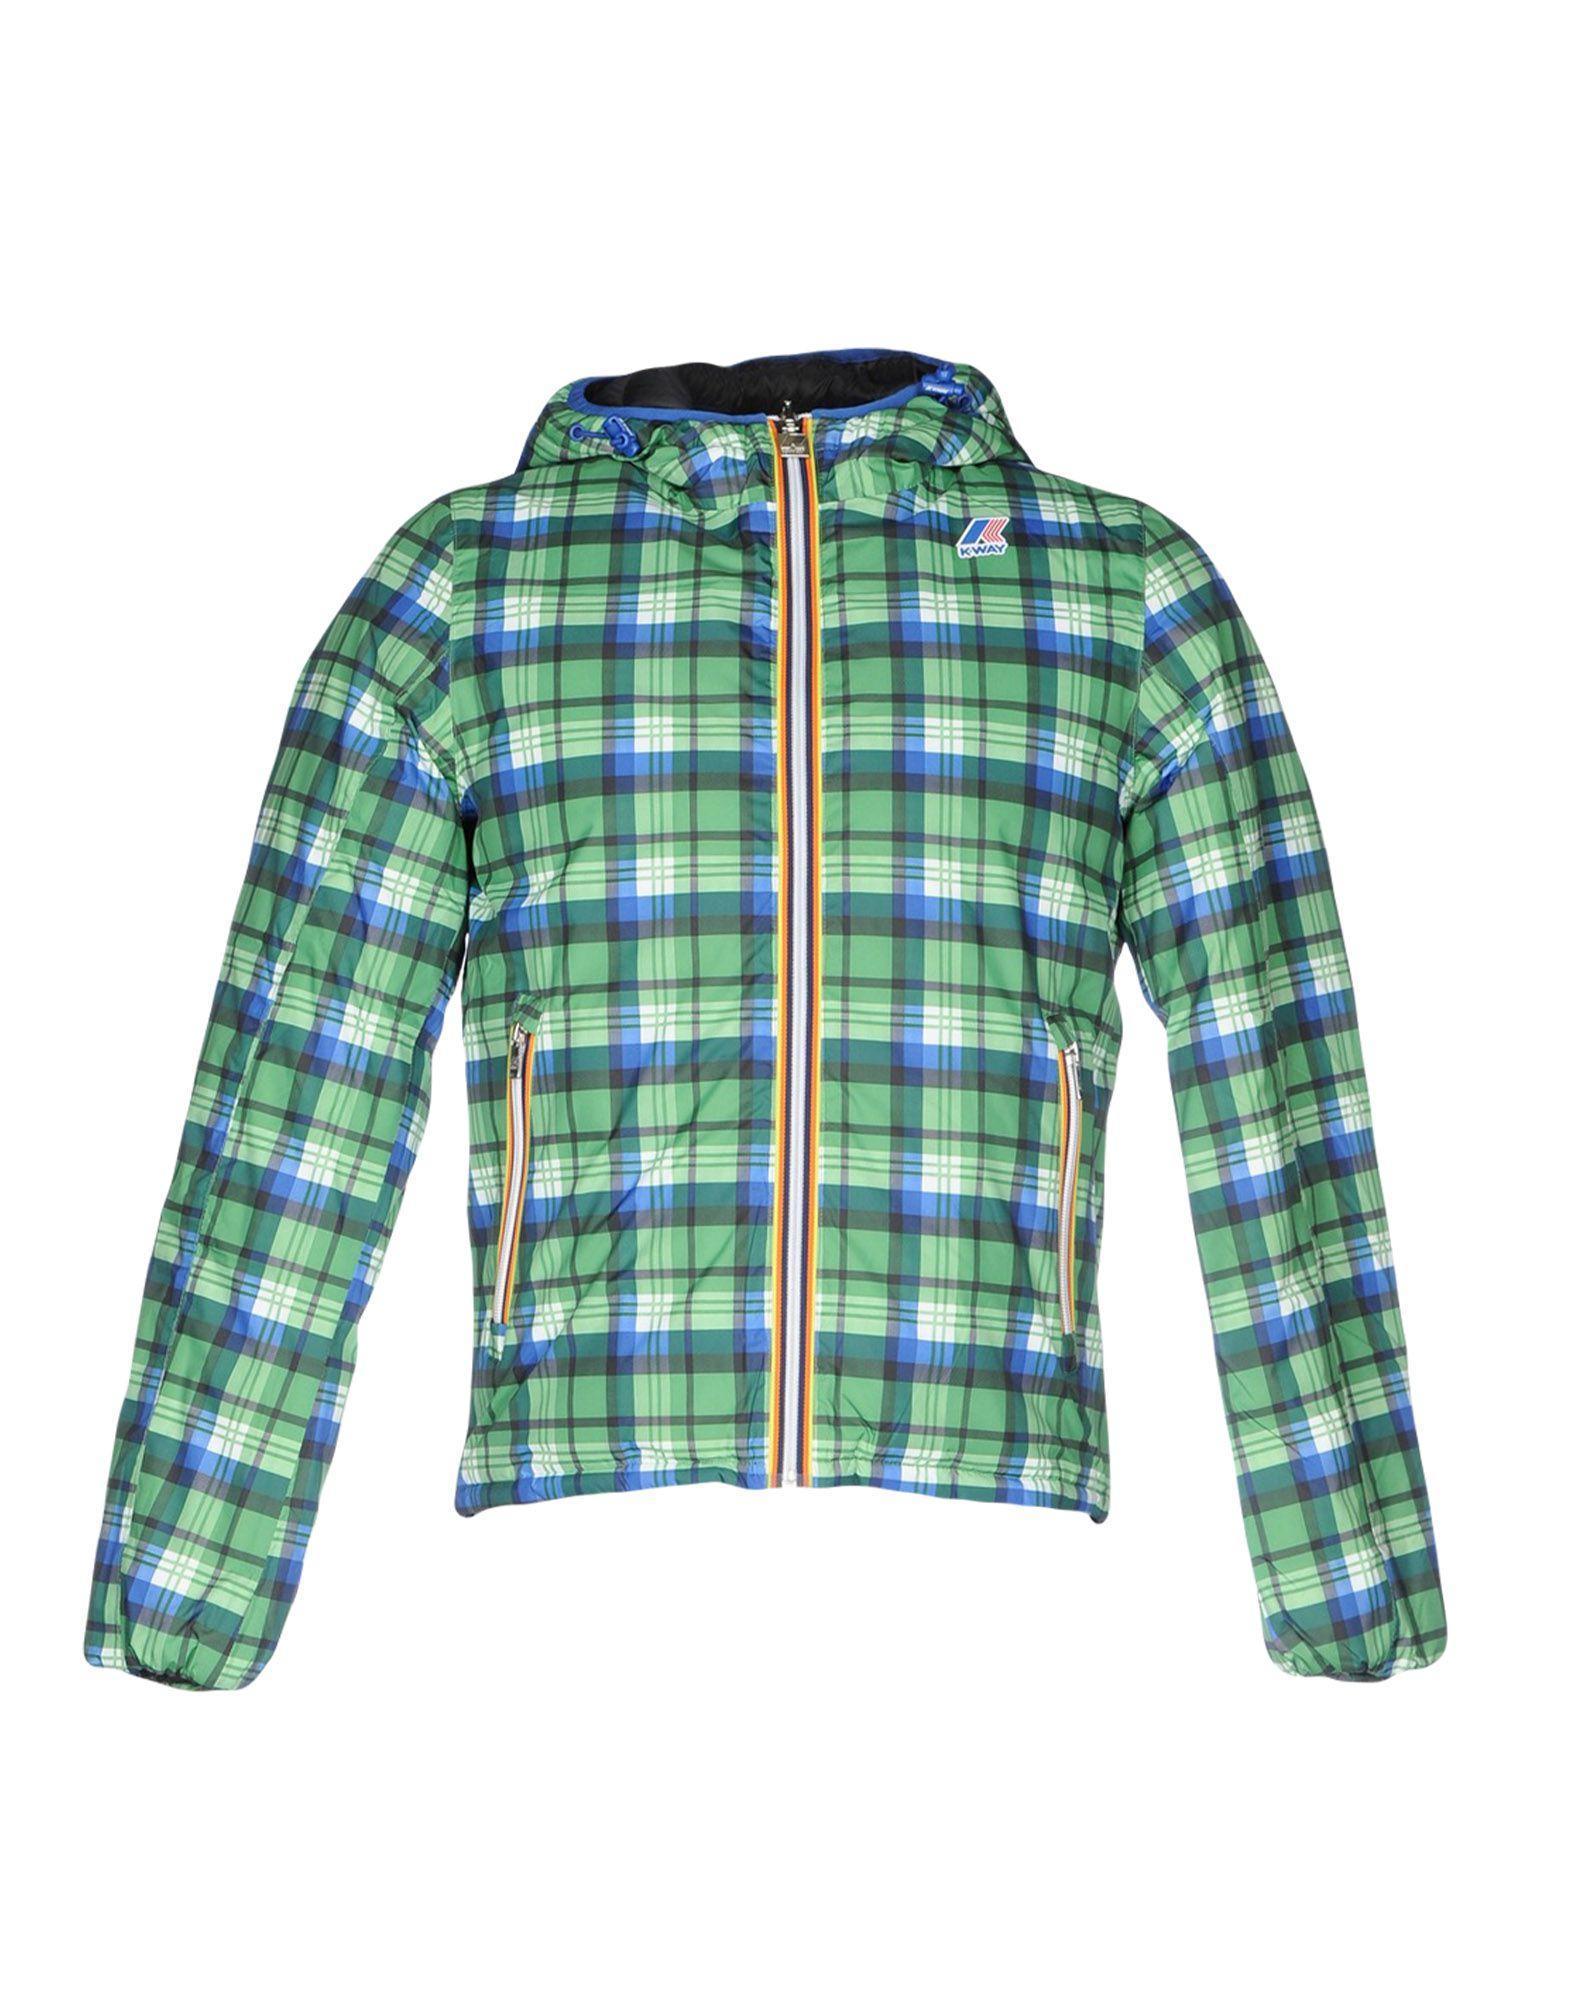 K-way Down Jacket In Green